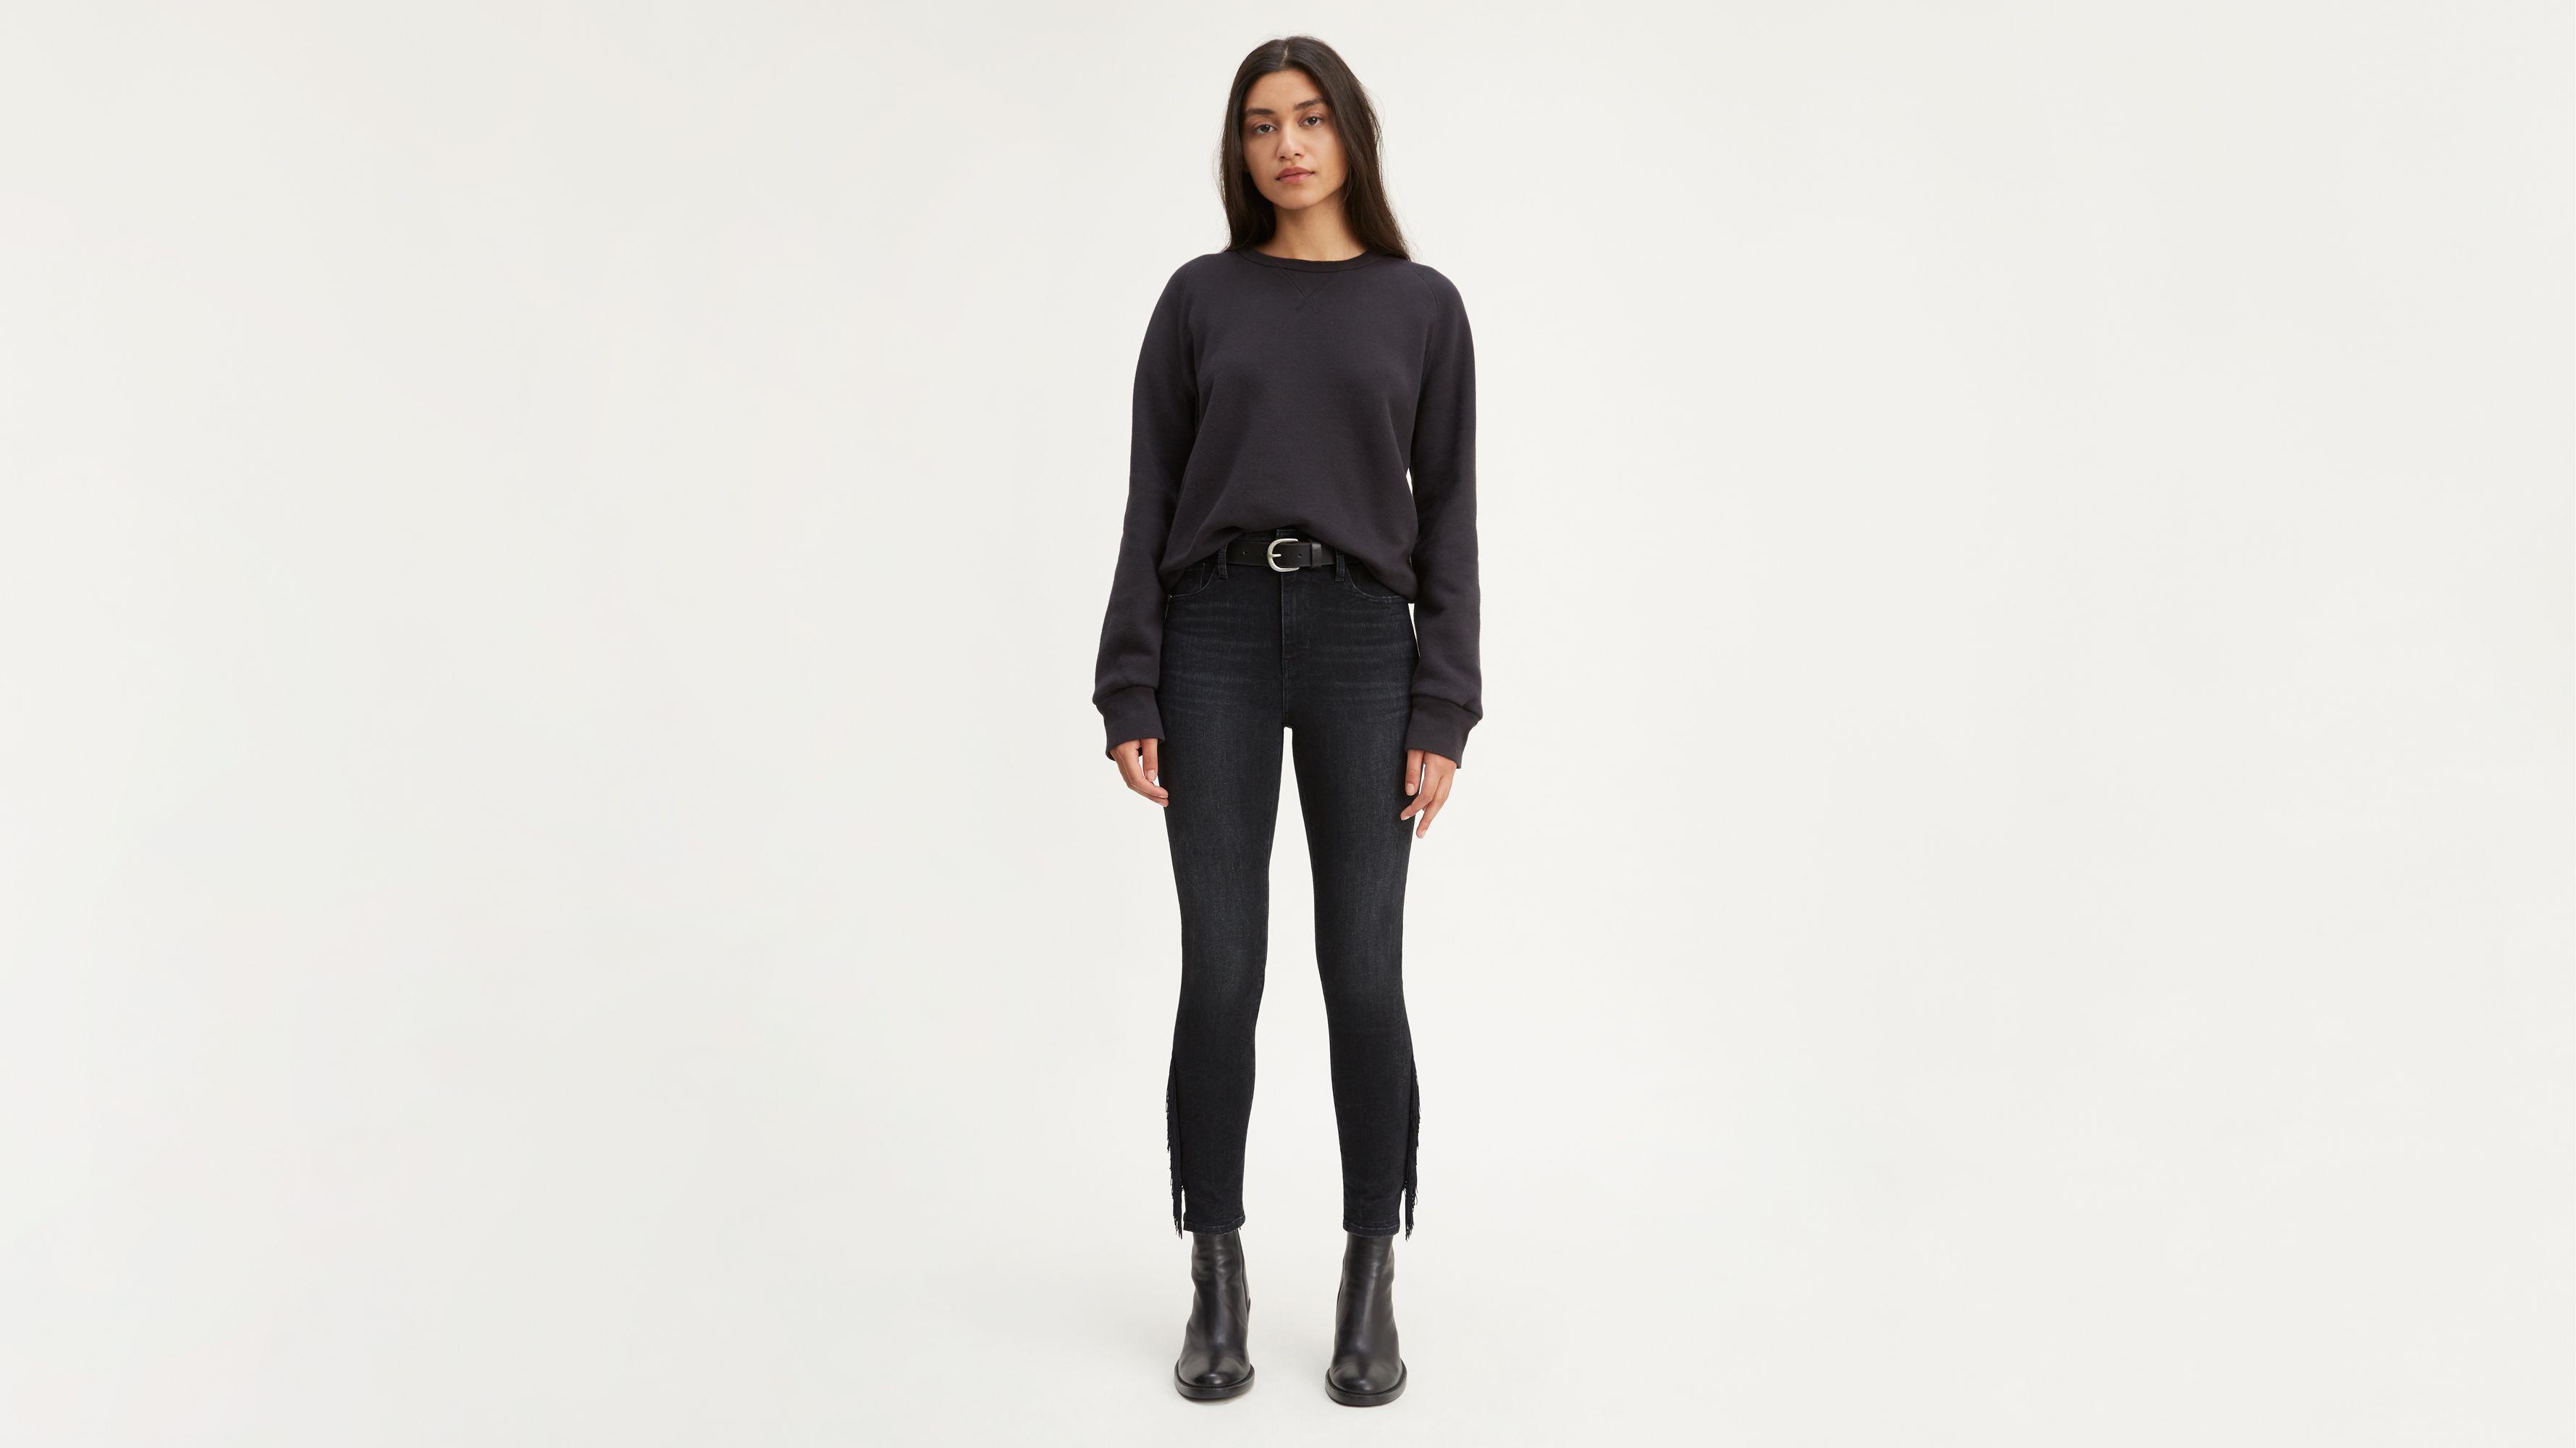 721 High Rise Fringe Ankle Women's Jeans